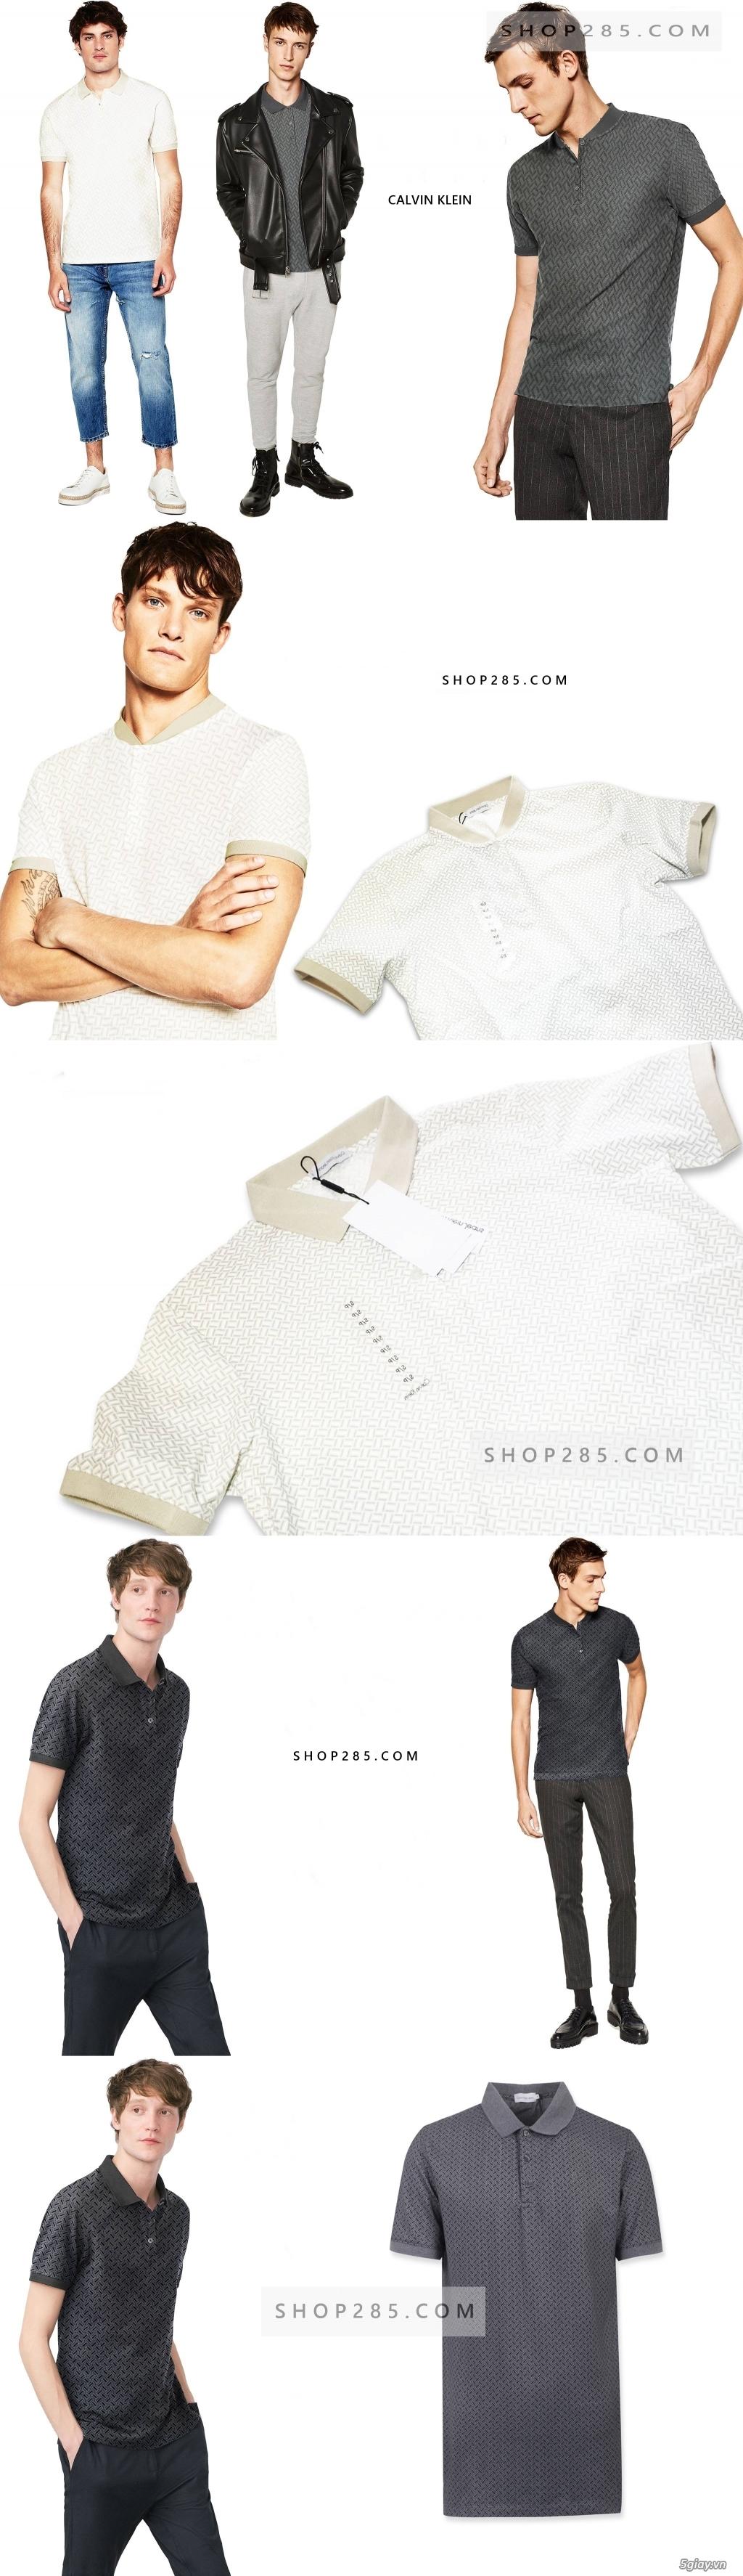 Shop285.com - Shop quần áo : Zara,Jules,Jake*s,,Hollister,Aber,CK,Tommy,Levis - 17